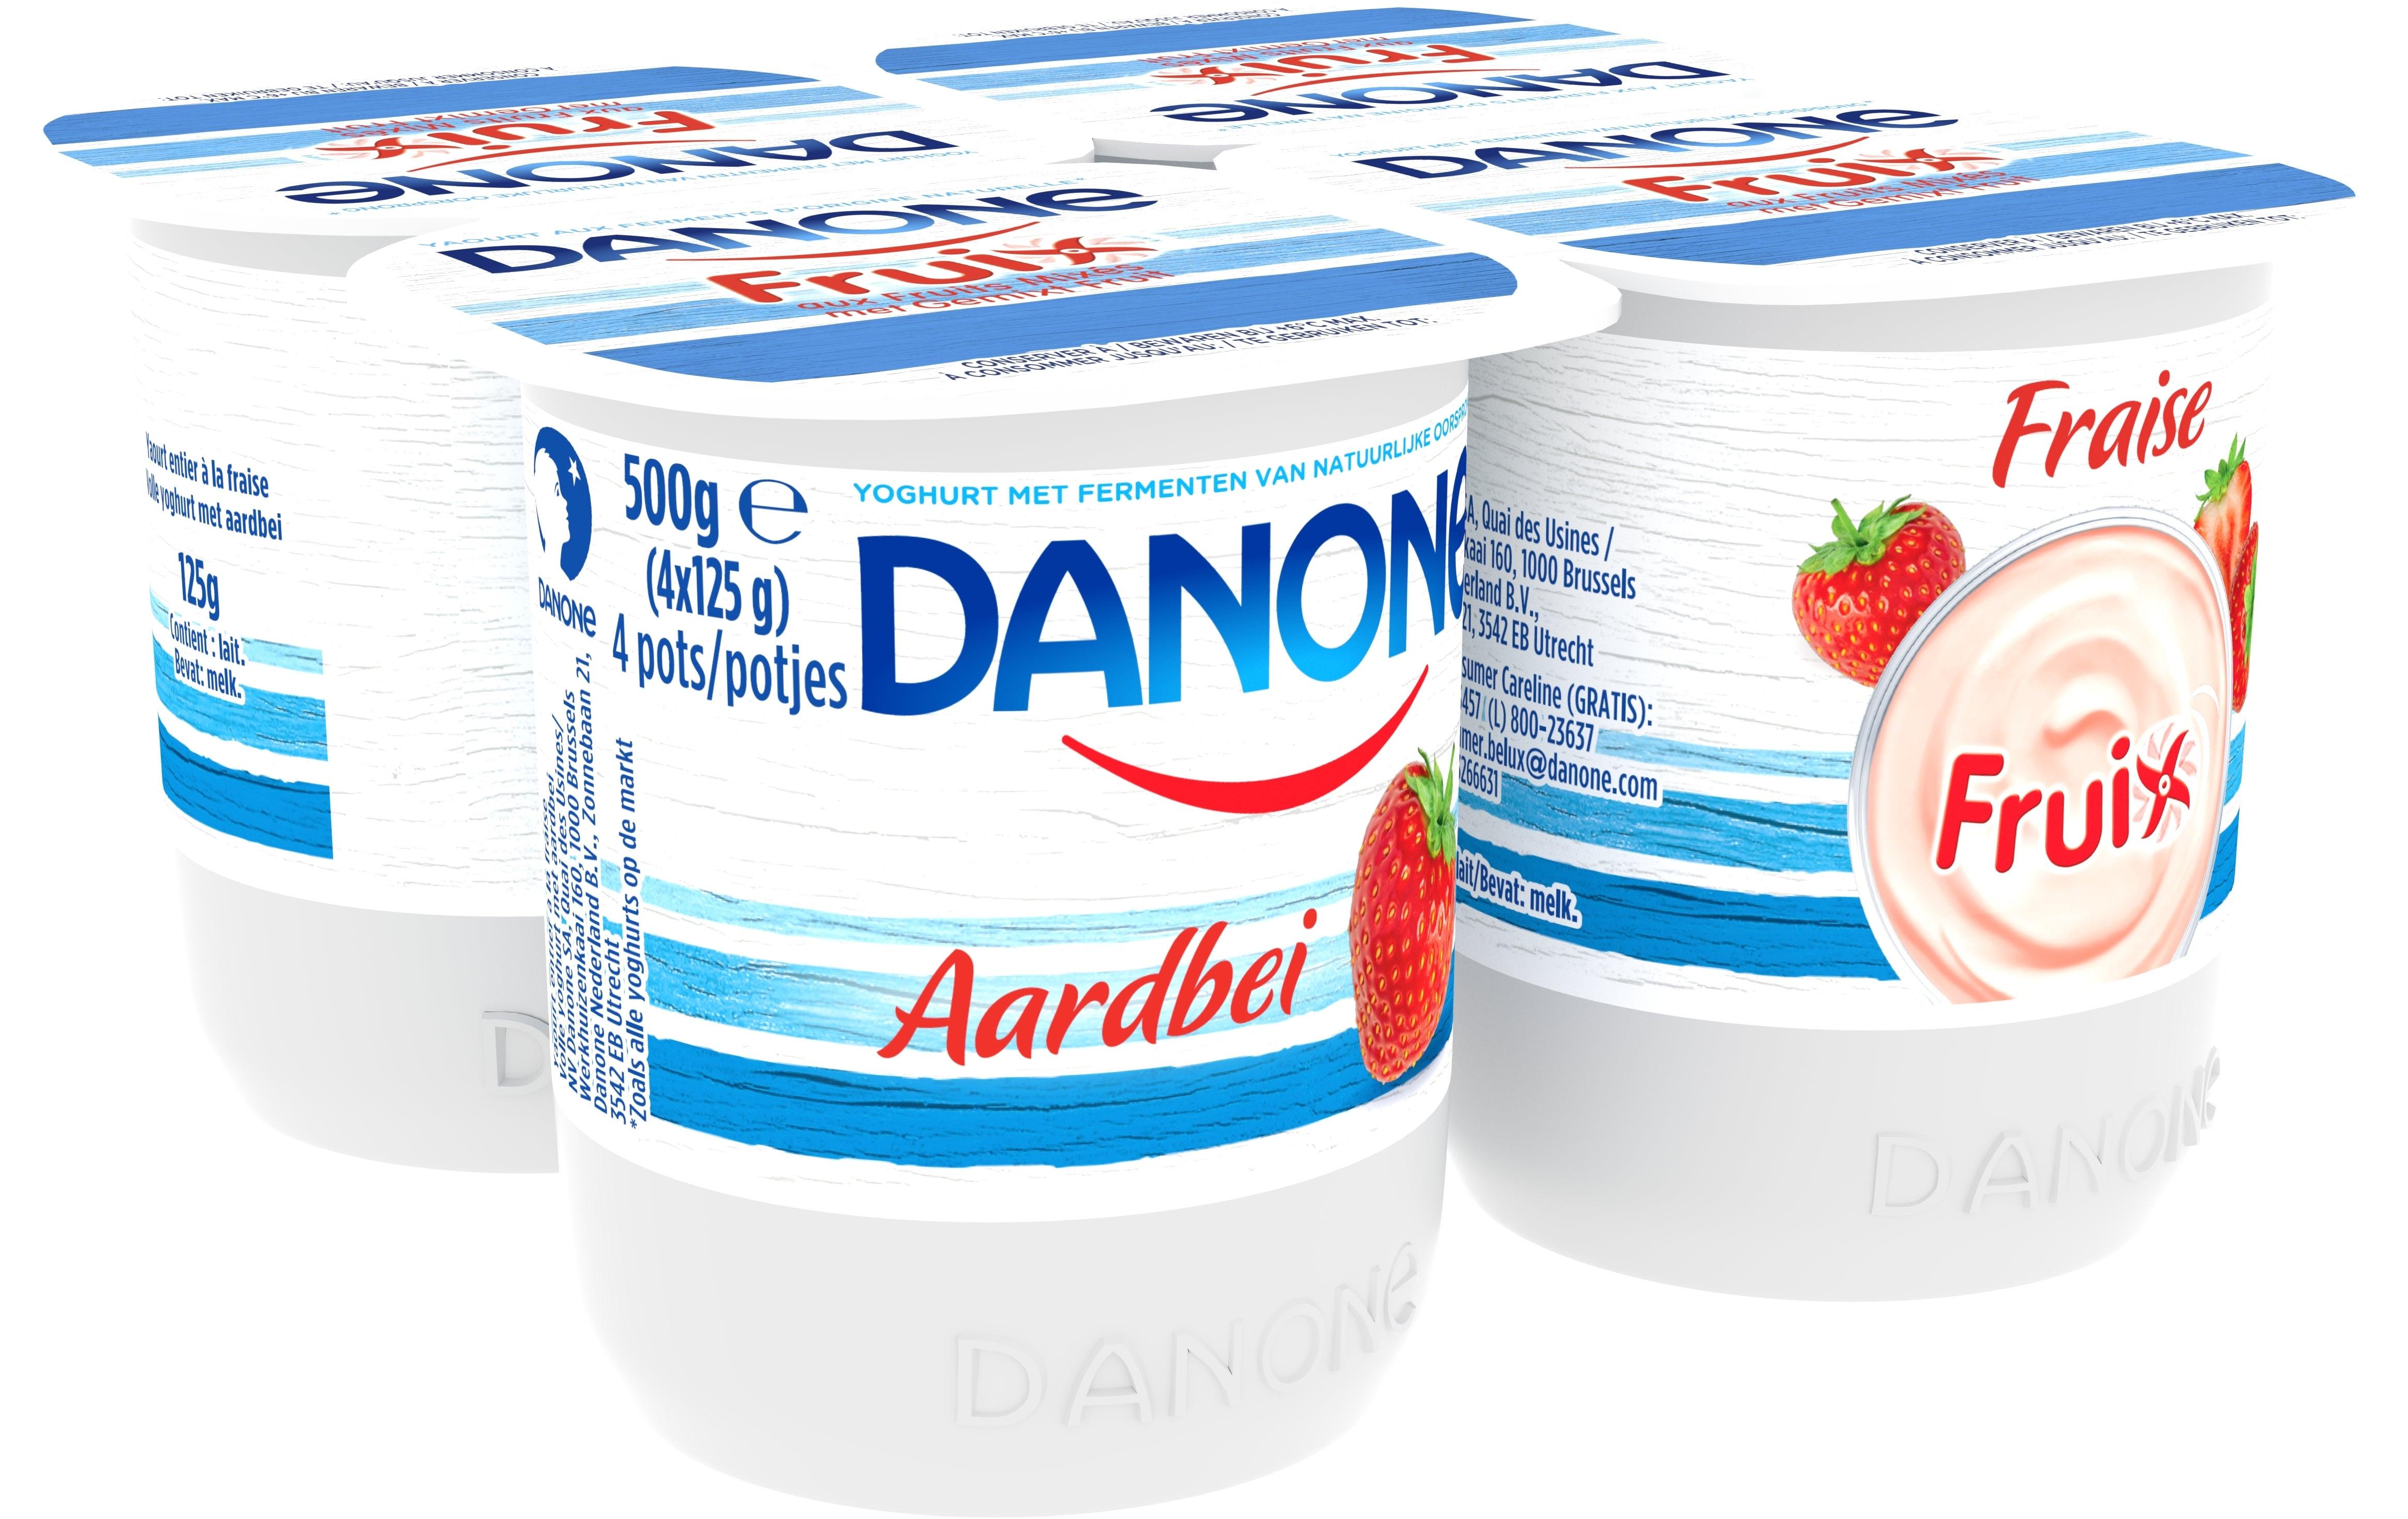 Danone Fruix Volle Yoghurt 4x125gr Aardbei